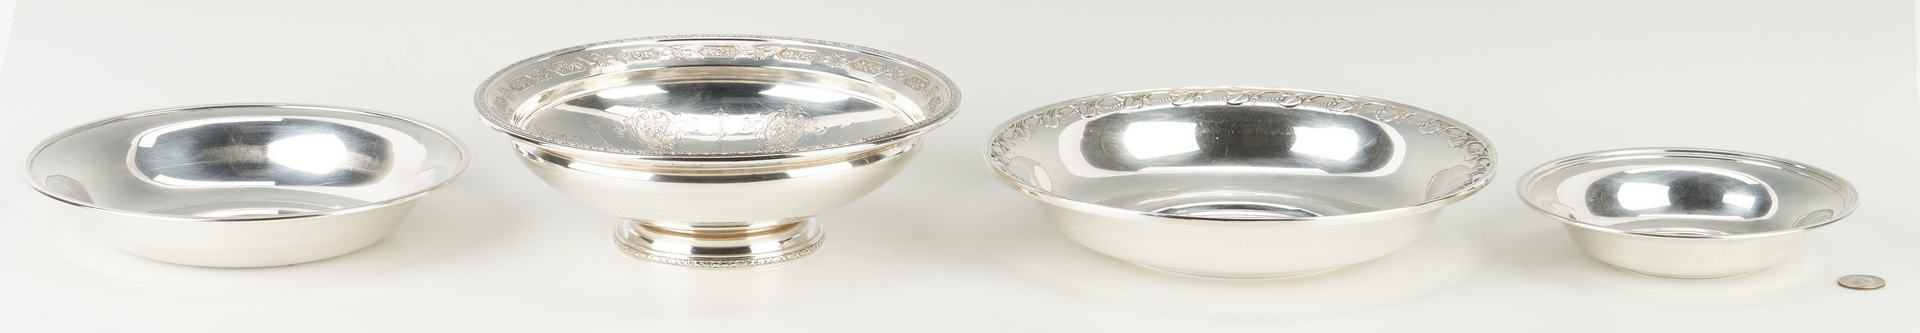 Lot 515: 4 Sterling Serving Bowls inc. Towle Louis XVI